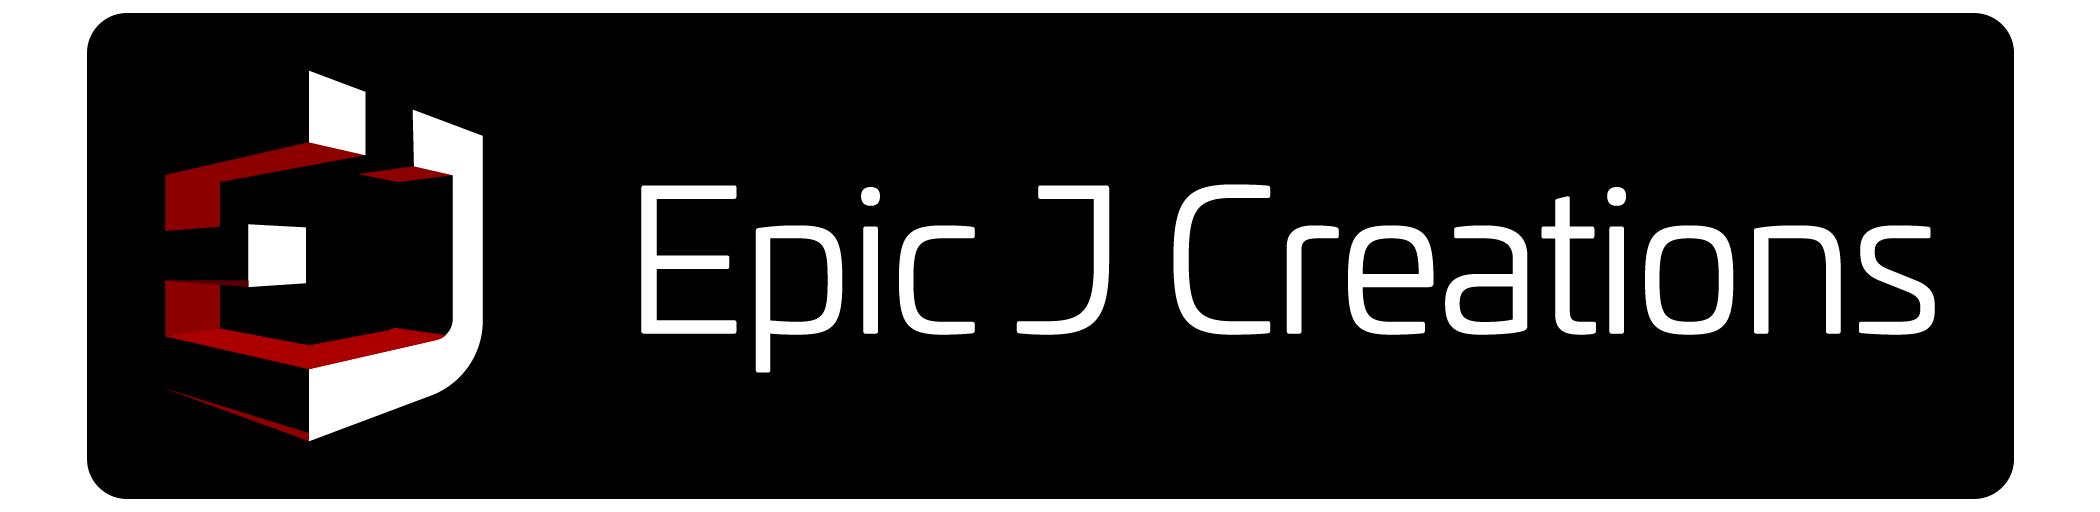 Shop Epic J Creations